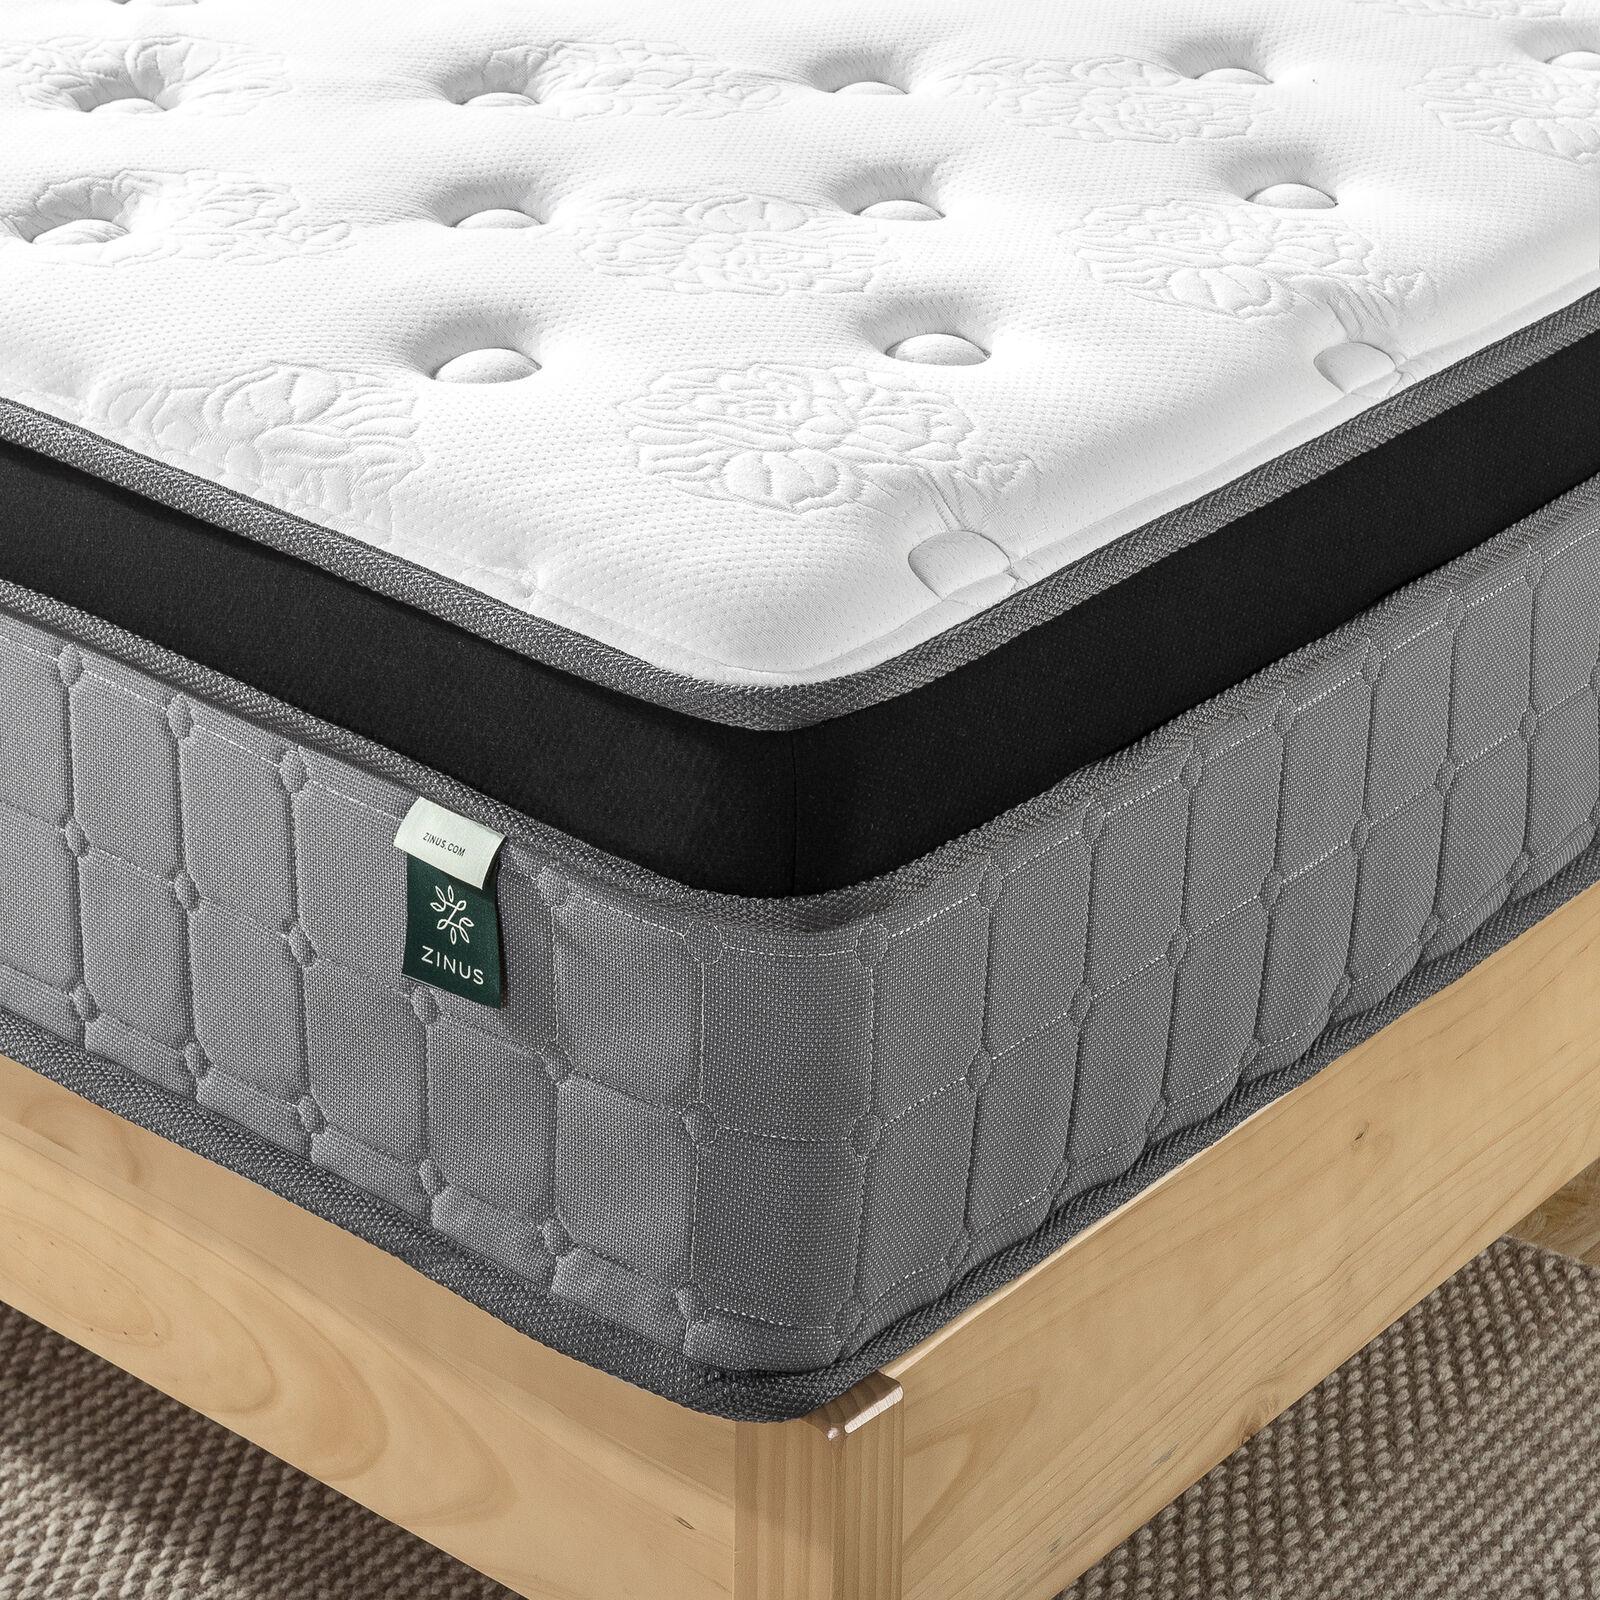 thumbnail 59 - Zinus Mattress Queen Double King Single Bed Memory Foam Pocket Spring Hybrid